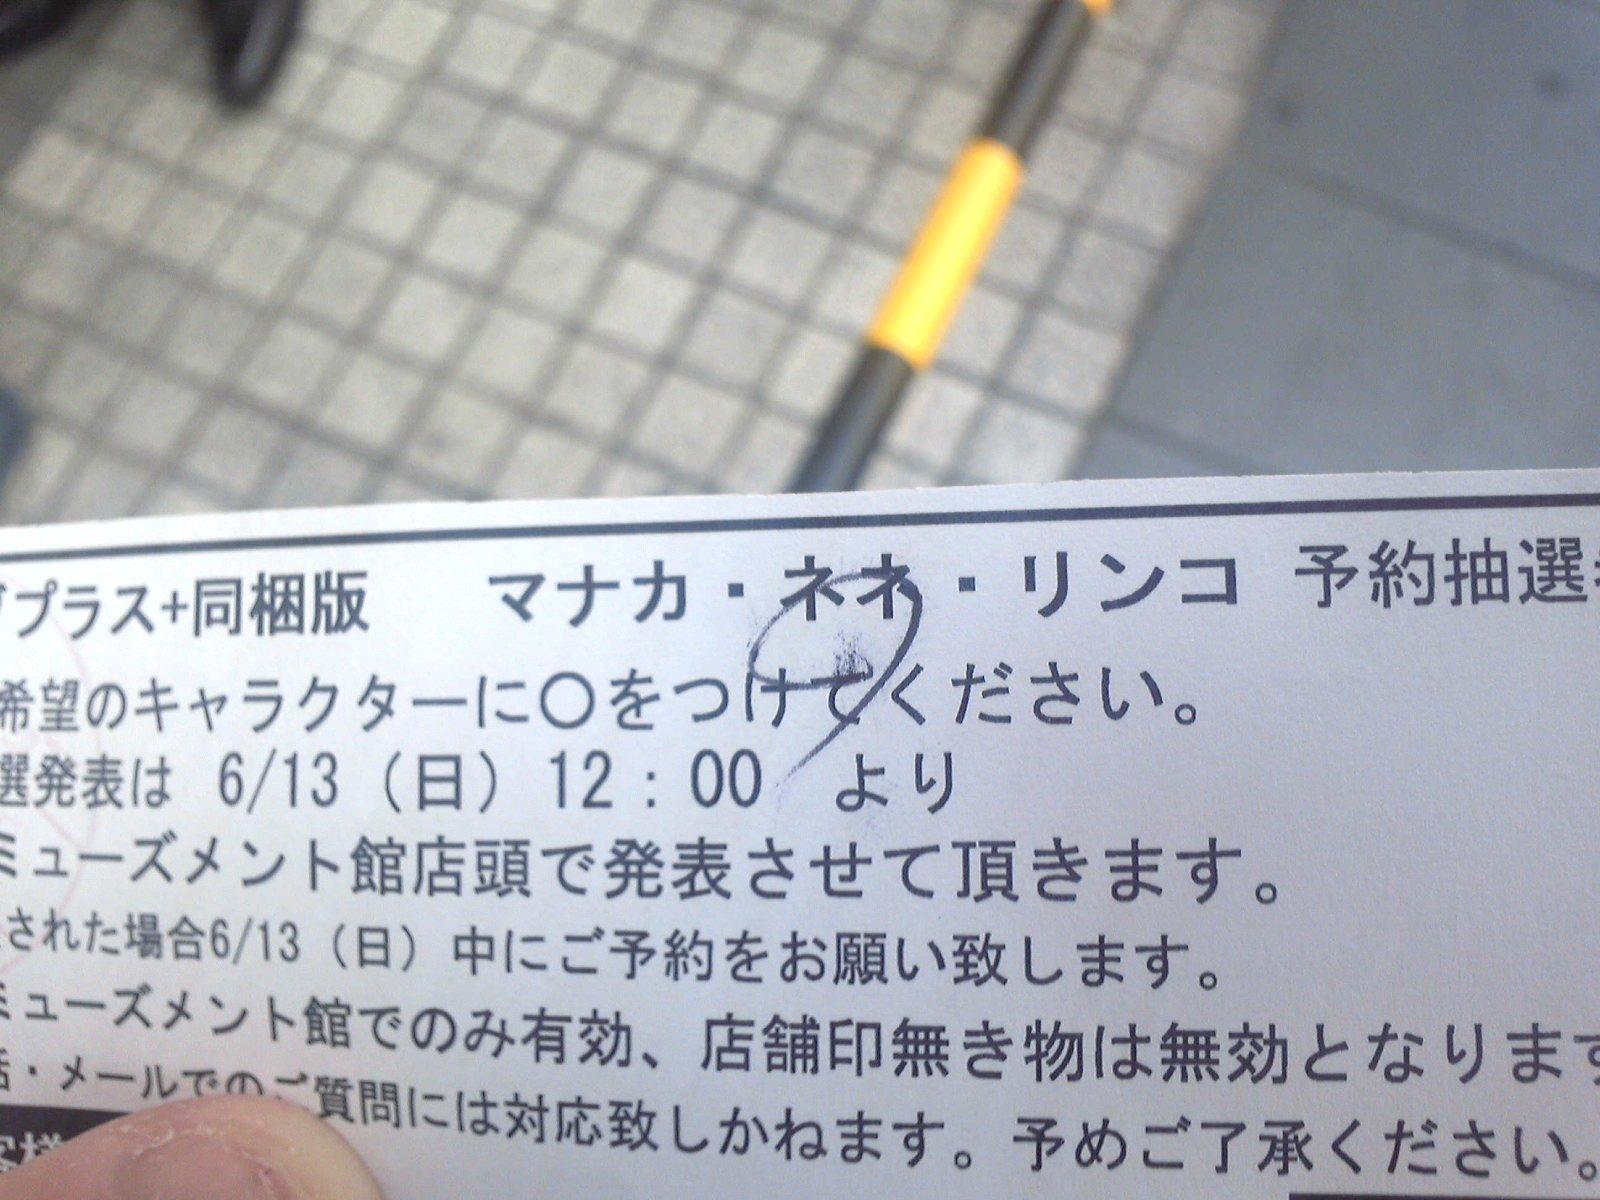 http://livedoor.blogimg.jp/upruyo/imgs/0/8/08d61bf0.jpg